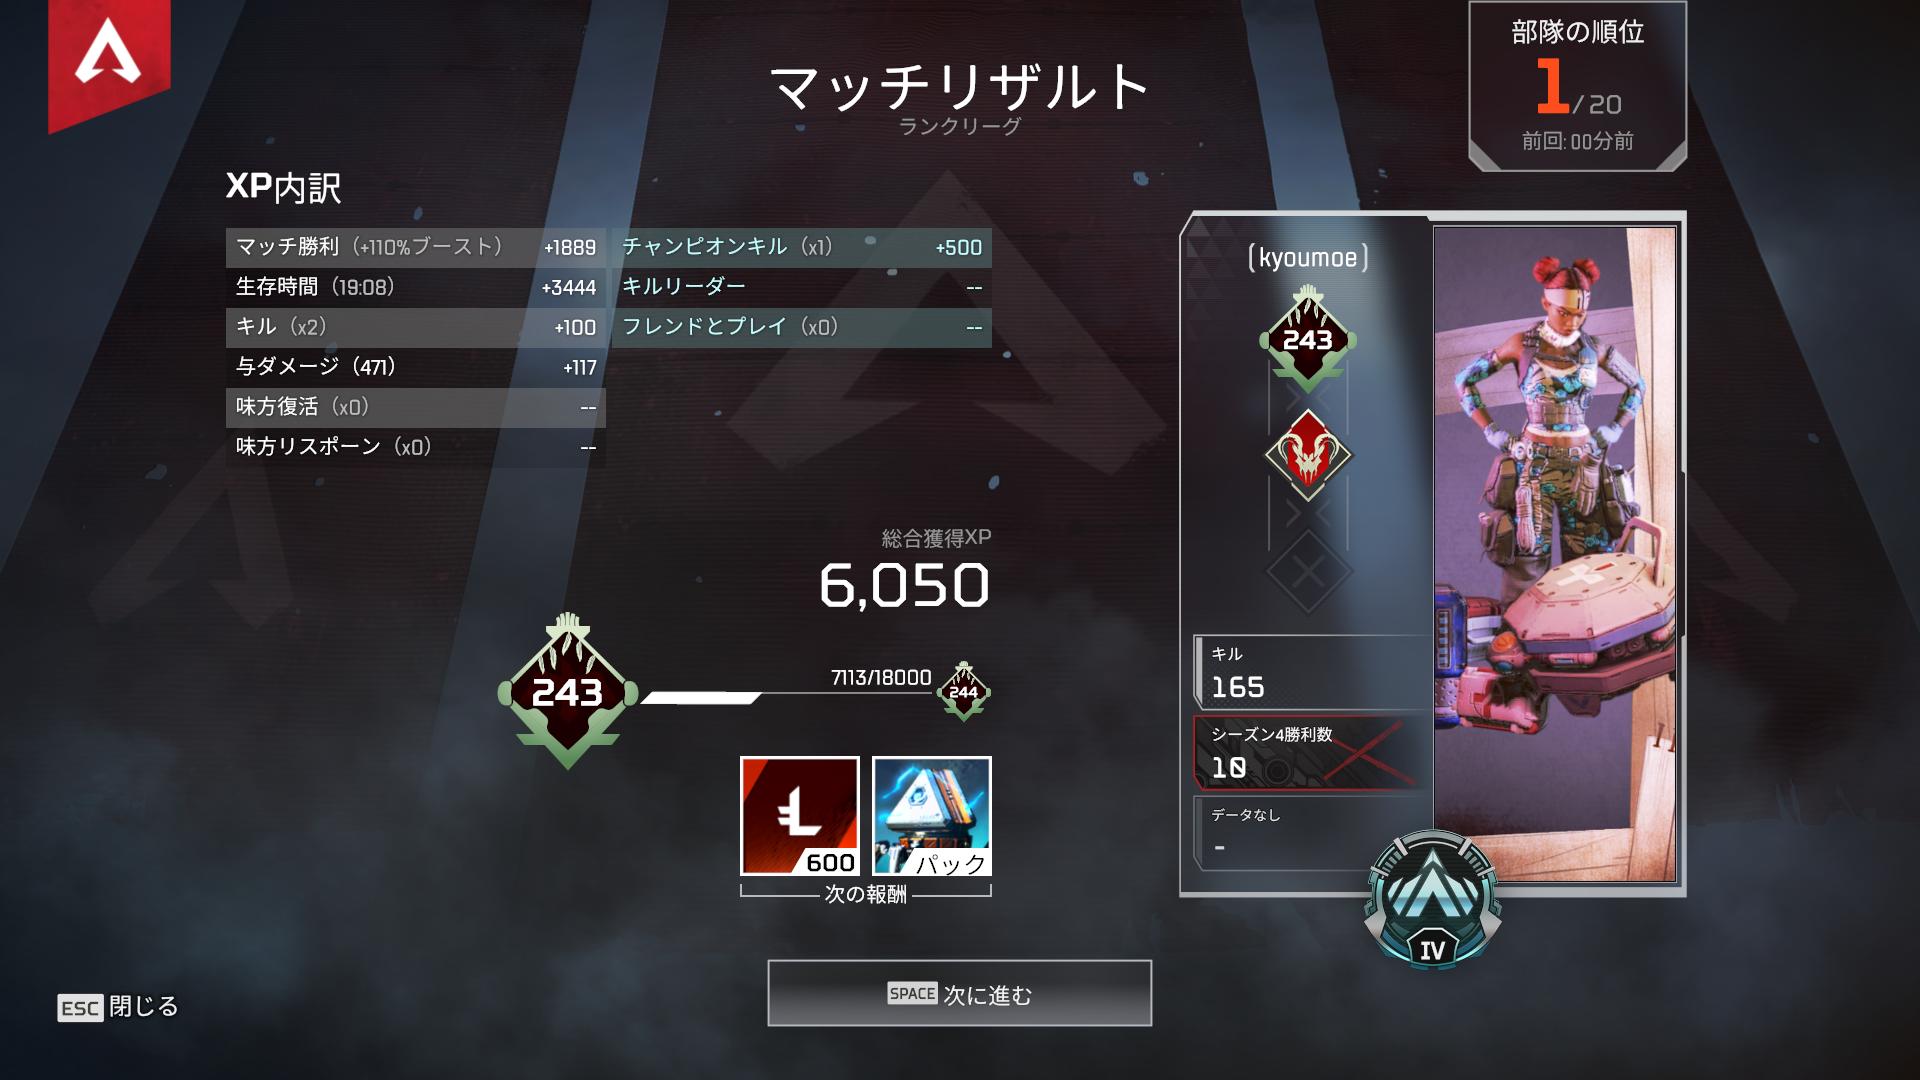 f:id:kyoumoe:20200319181352p:plain